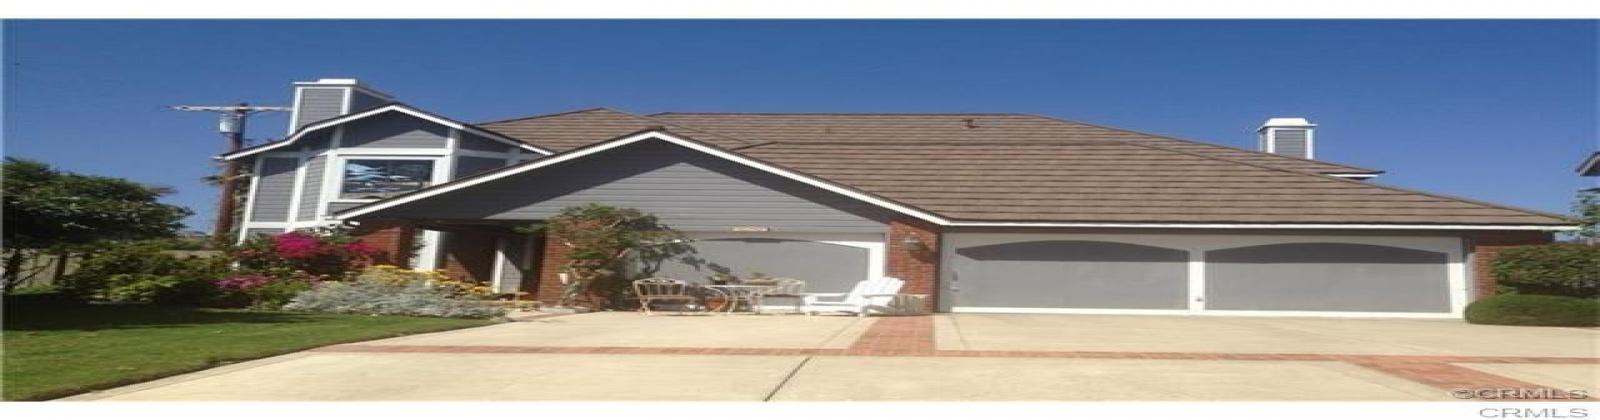 35242 Vista De Todo, Dana Point, California 92624, 4 Bedrooms Bedrooms, ,3 BathroomsBathrooms,Home,Leased,Vista De Todo,1315